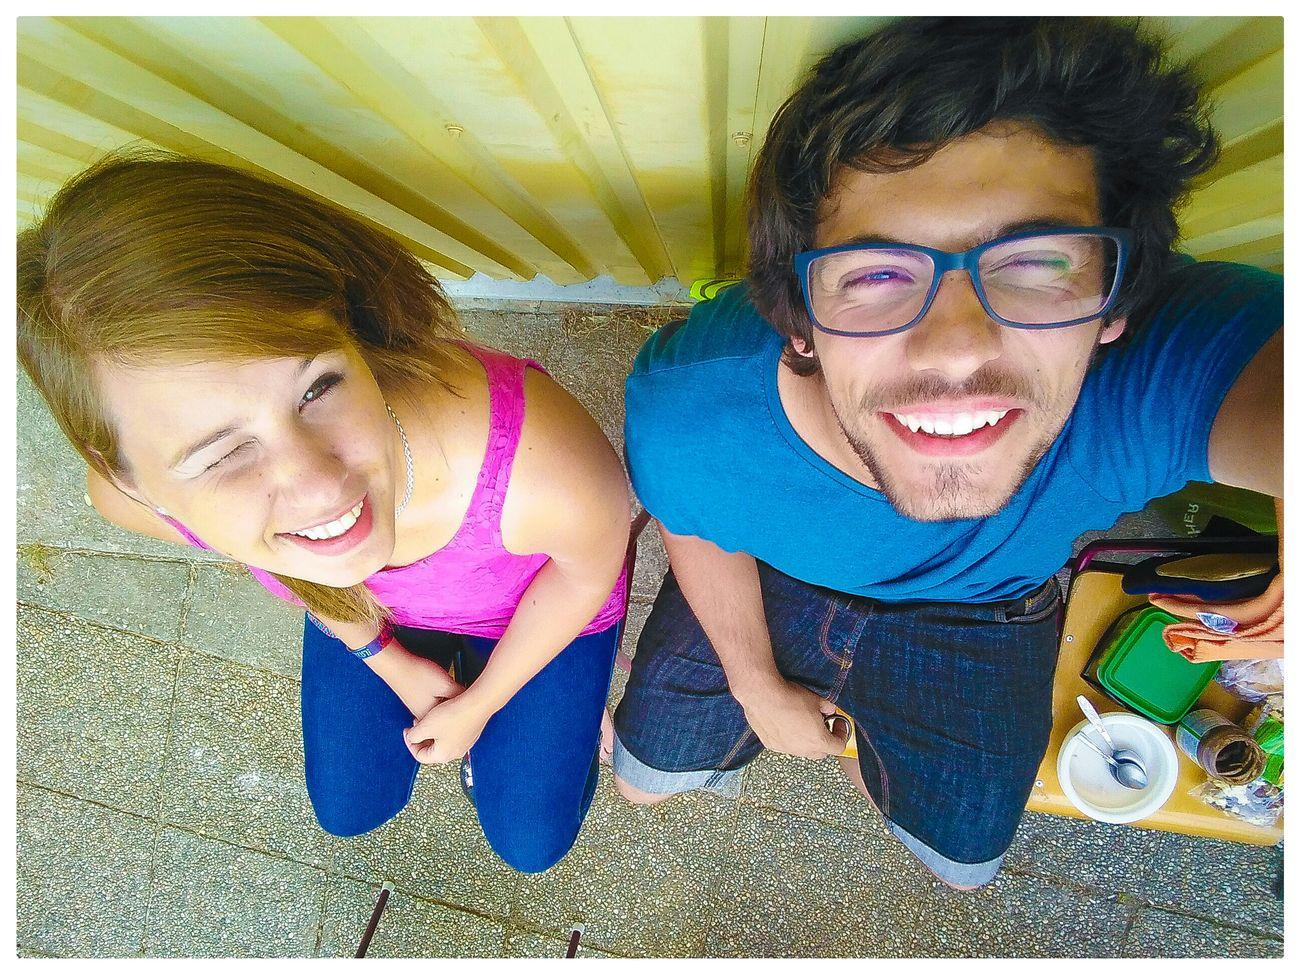 Friend CT2015 Christeens 2015  Tiredface Lostday Bestweek Minthanemaregivolnal Smile